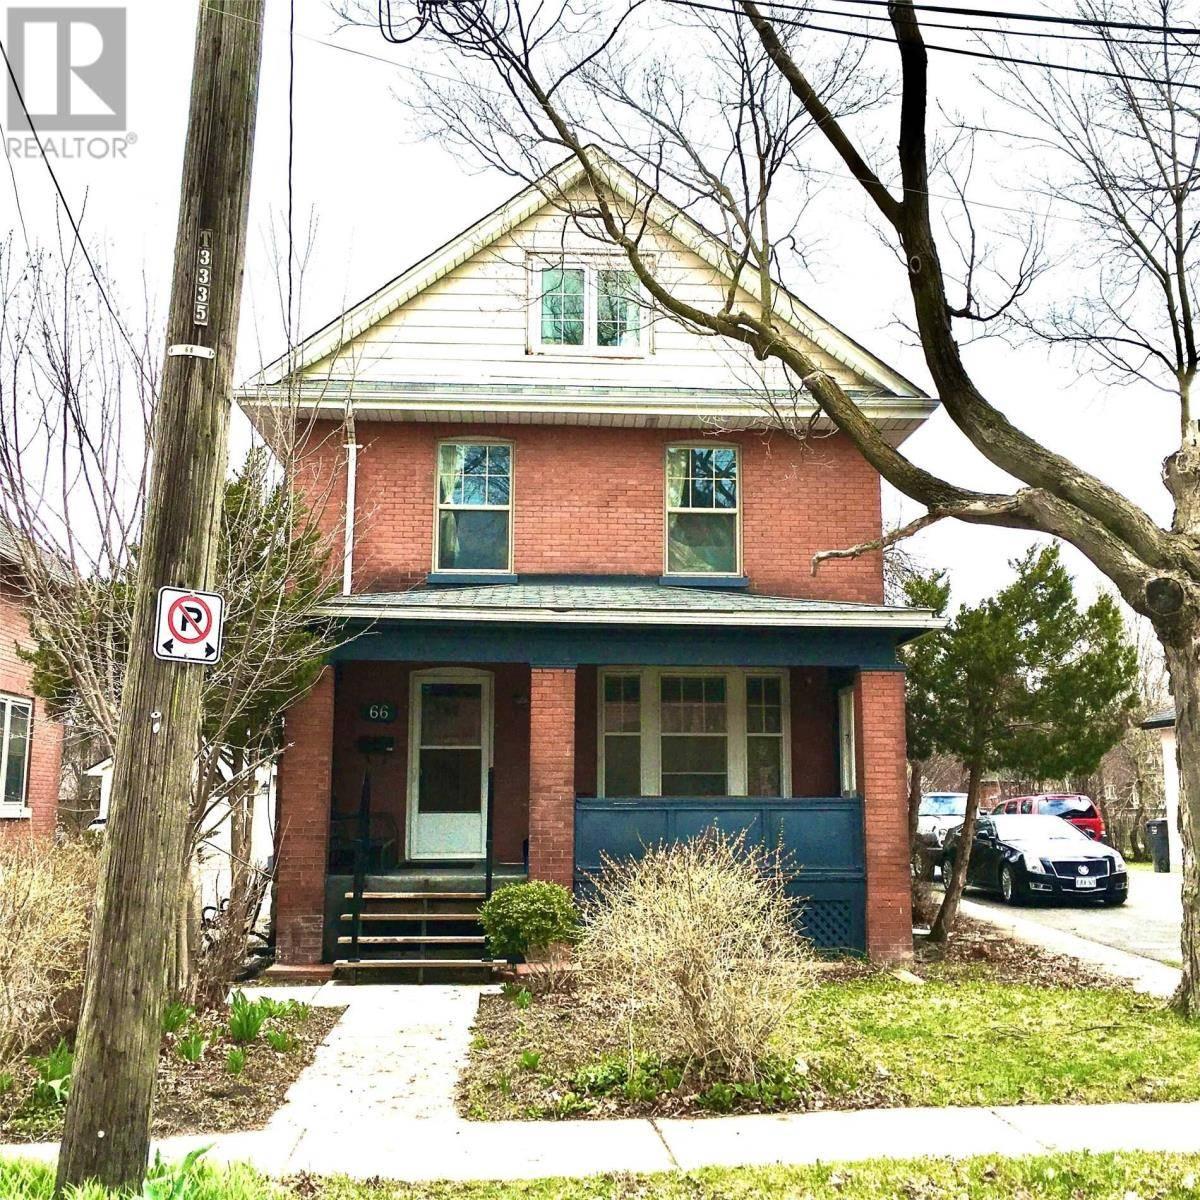 Townhouse for sale at 66 Joseph St North Unit L6X1H8 Brampton Ontario - MLS: W4743220